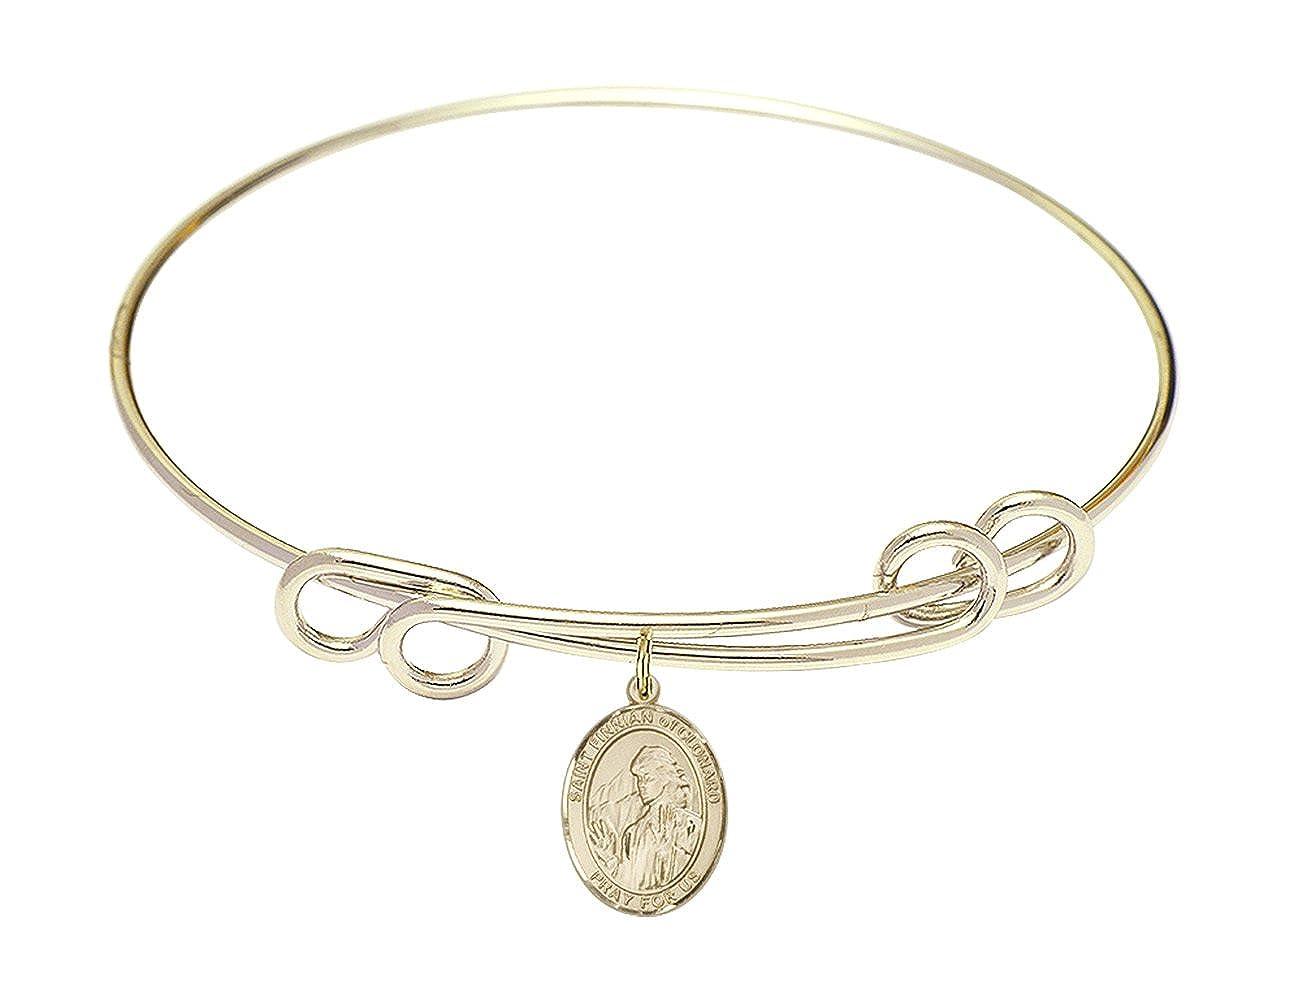 Finnian of Clonard Charm. DiamondJewelryNY Double Loop Bangle Bracelet with a St